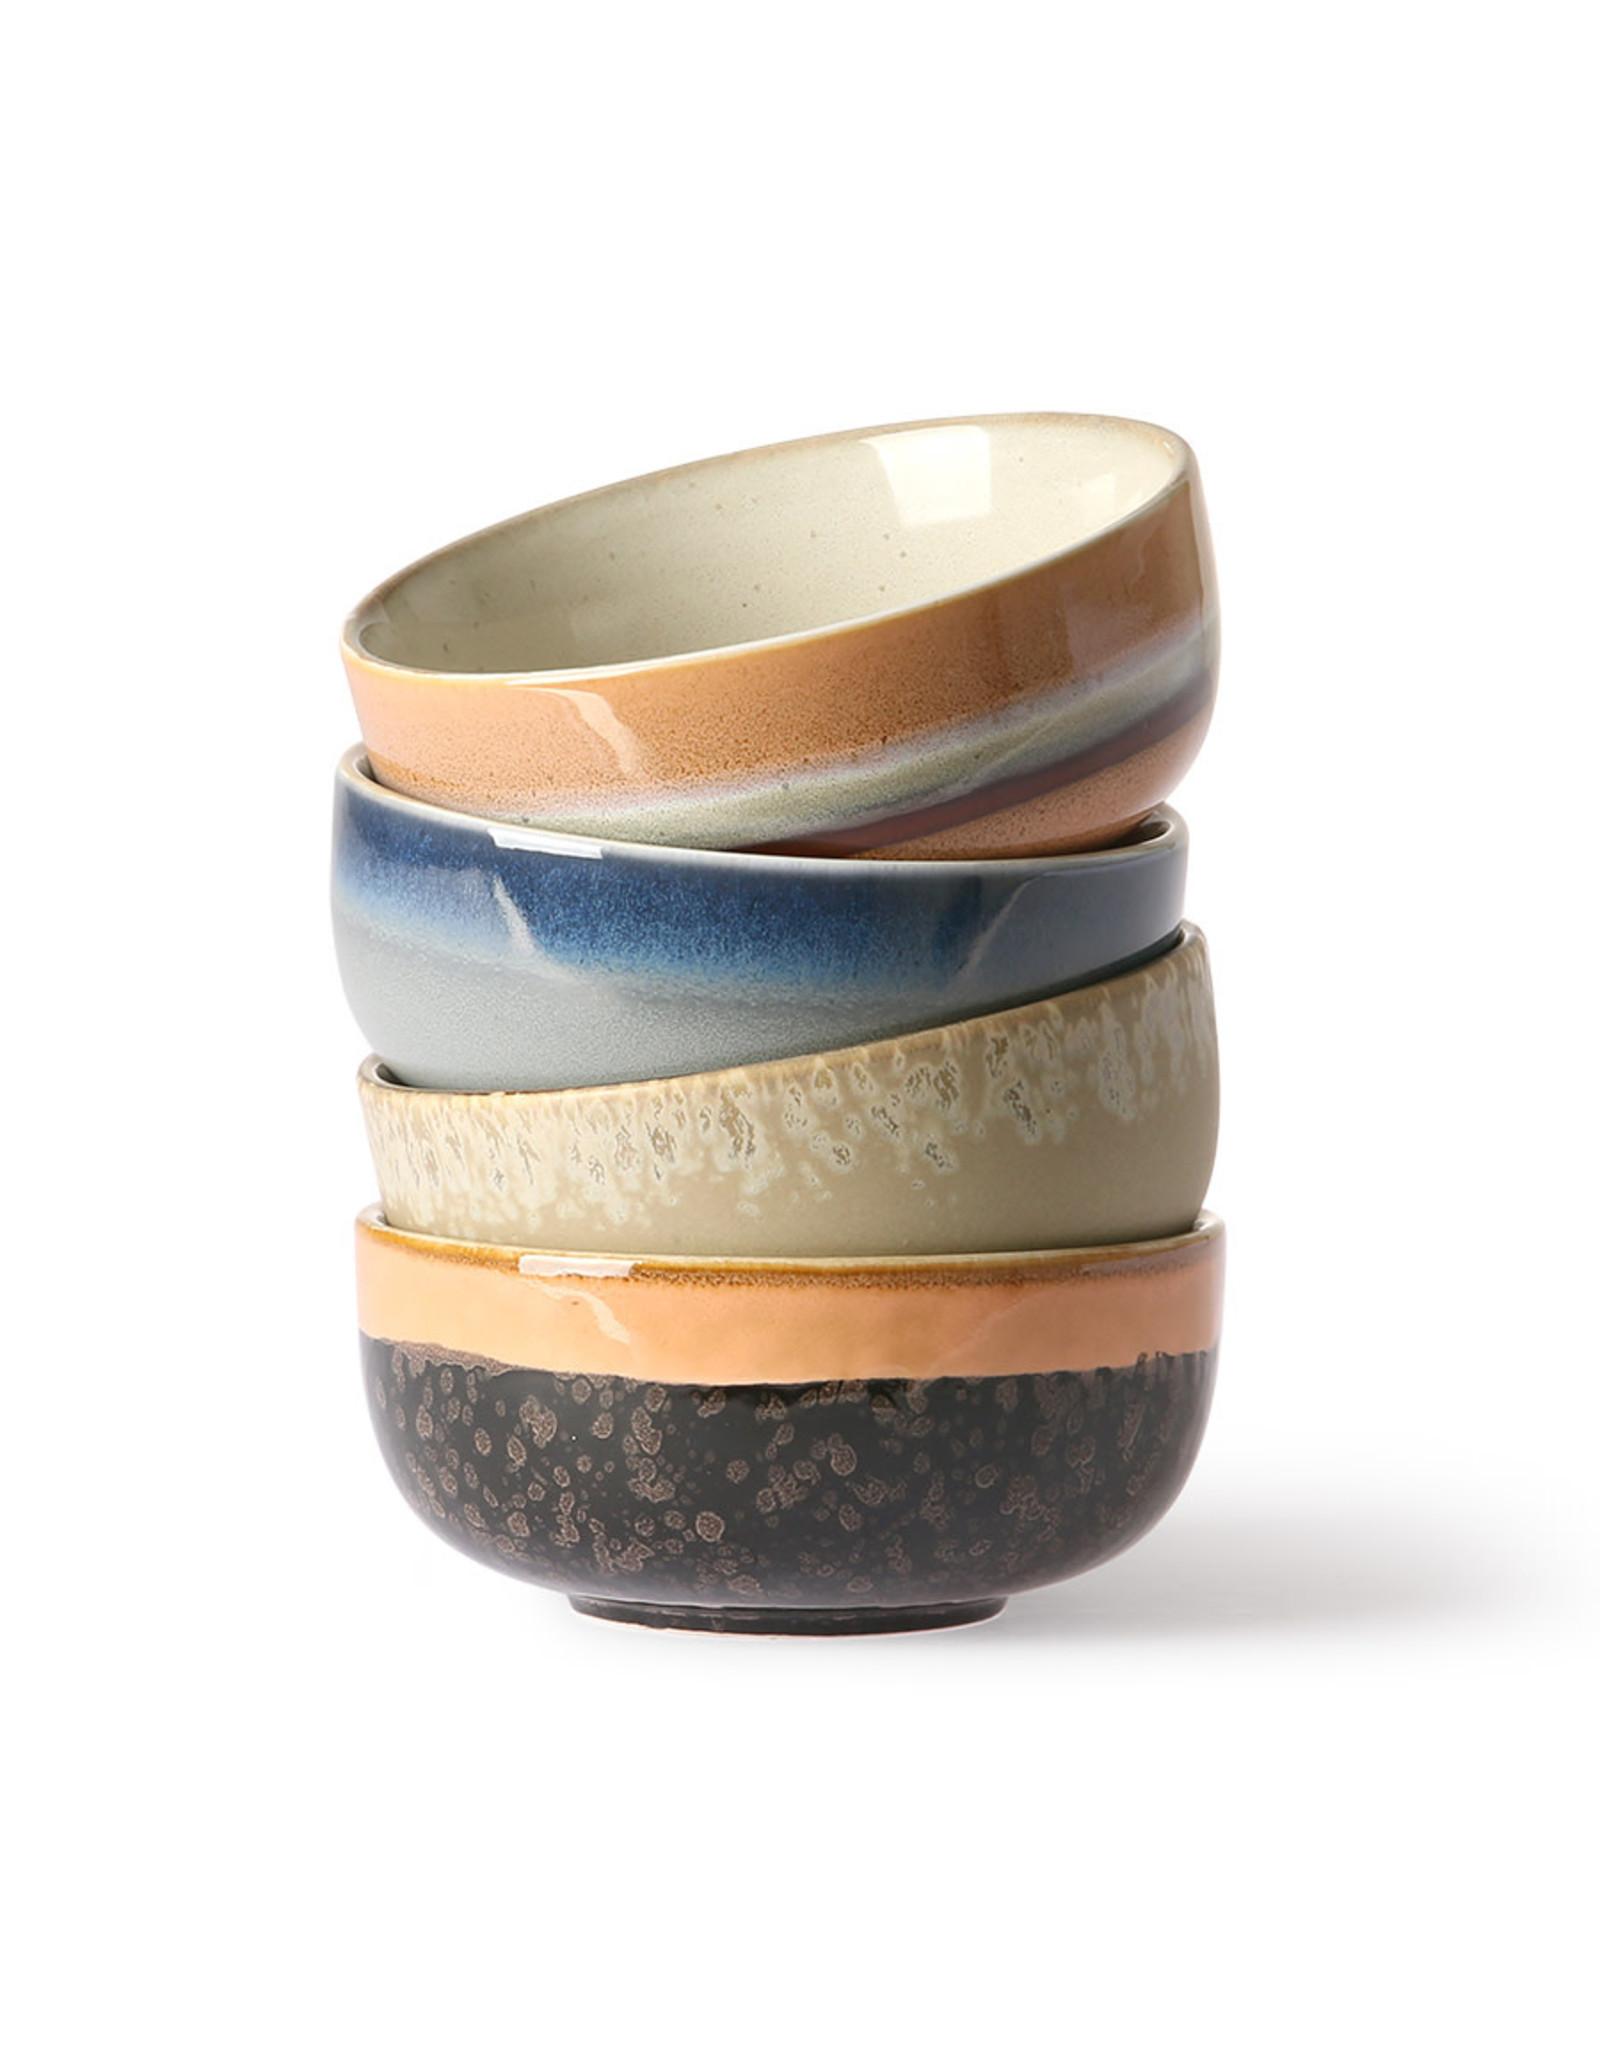 HKliving Ceramic 70's Medium Bowls ACE6877